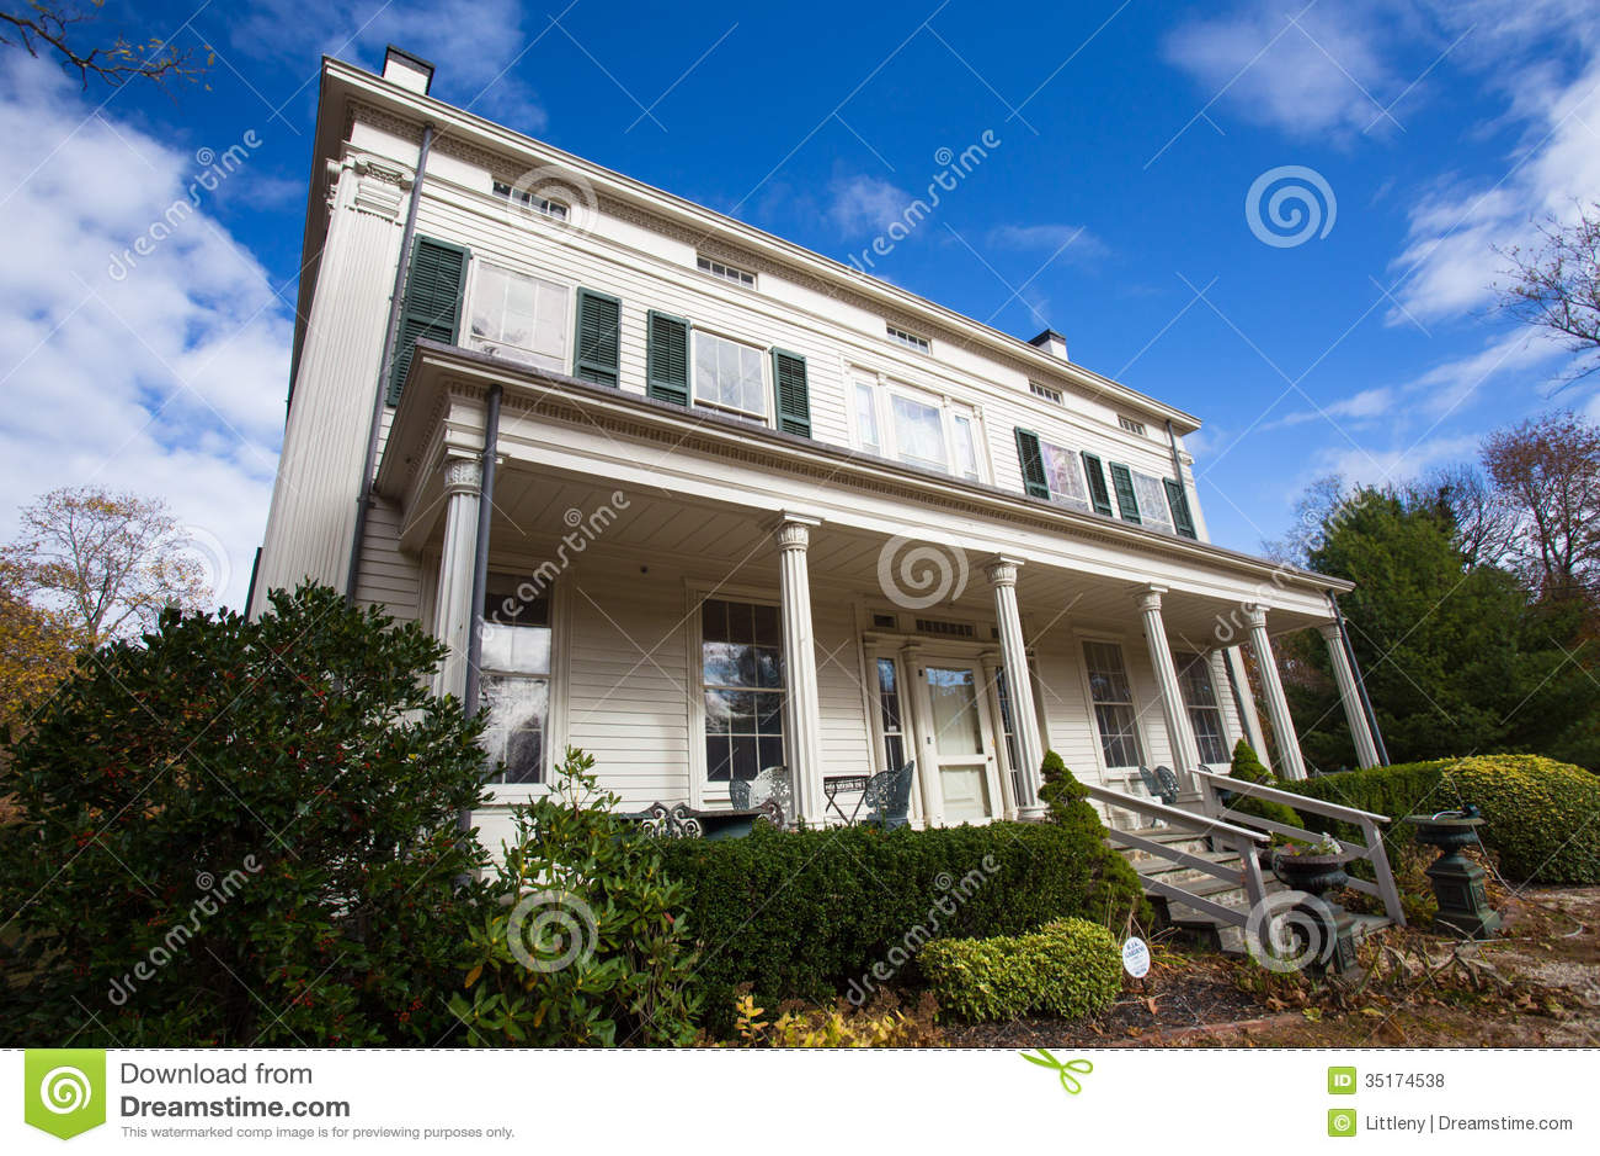 Directions - Deepwells Farm - St James, NY - yelpcom